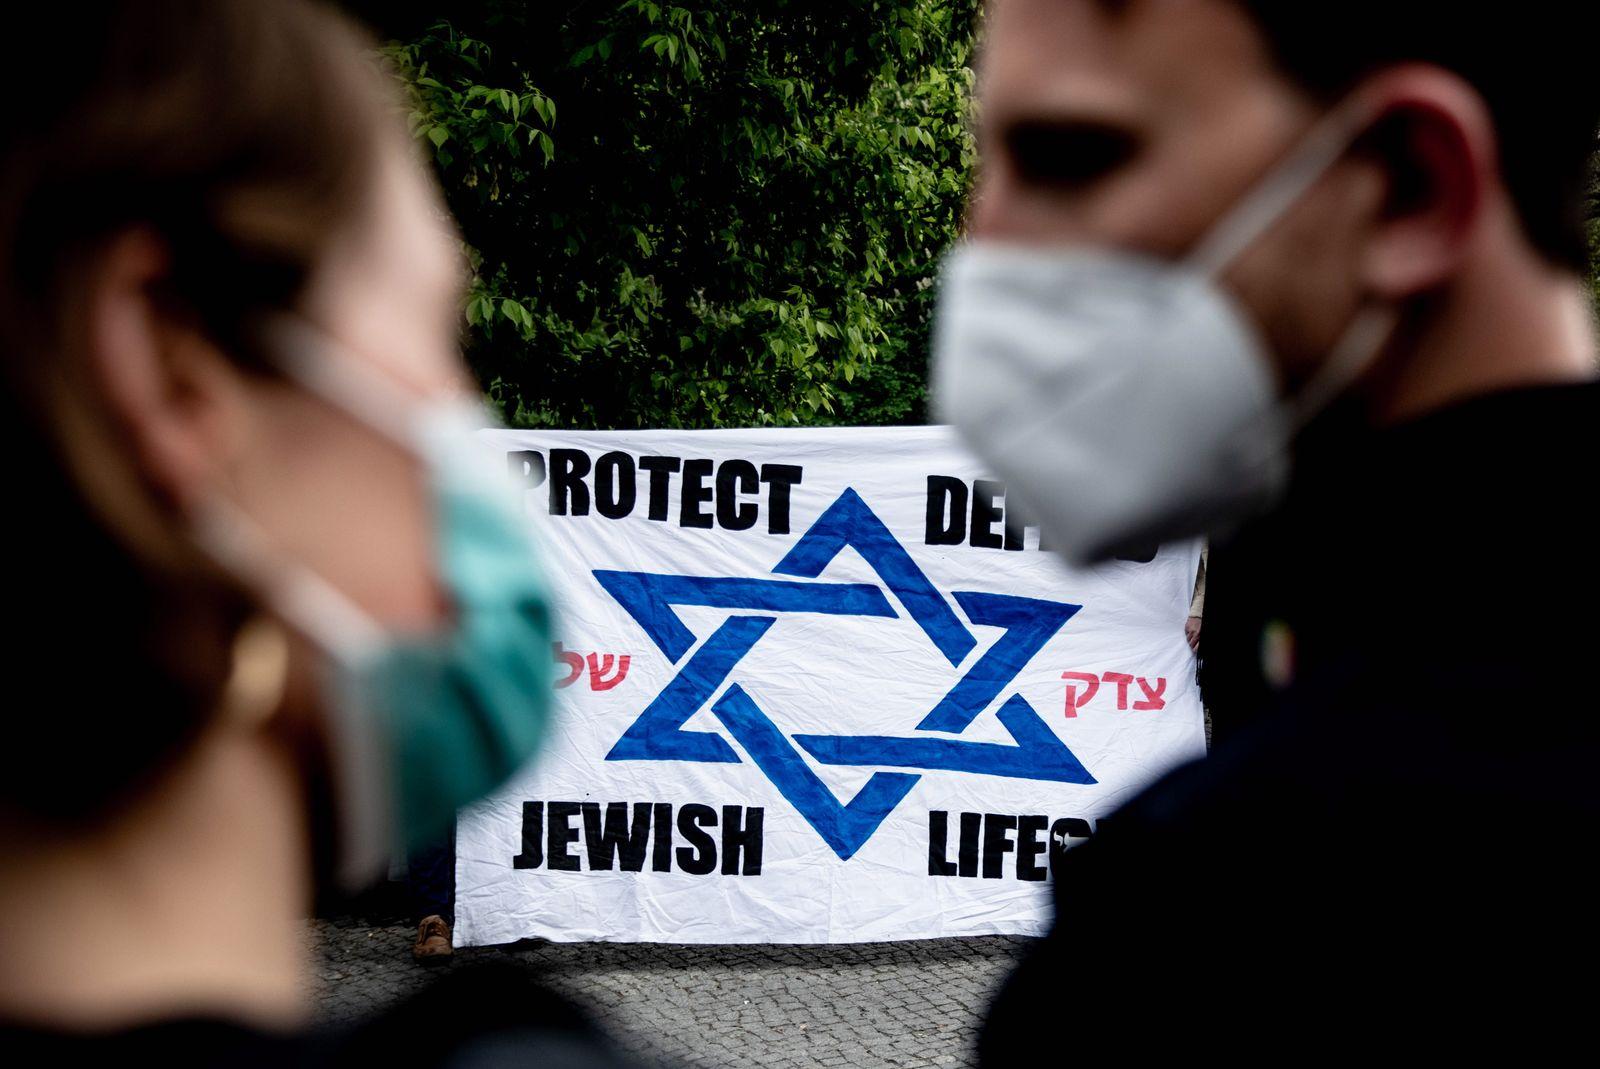 Vigil against anti-Semitism in Berlin